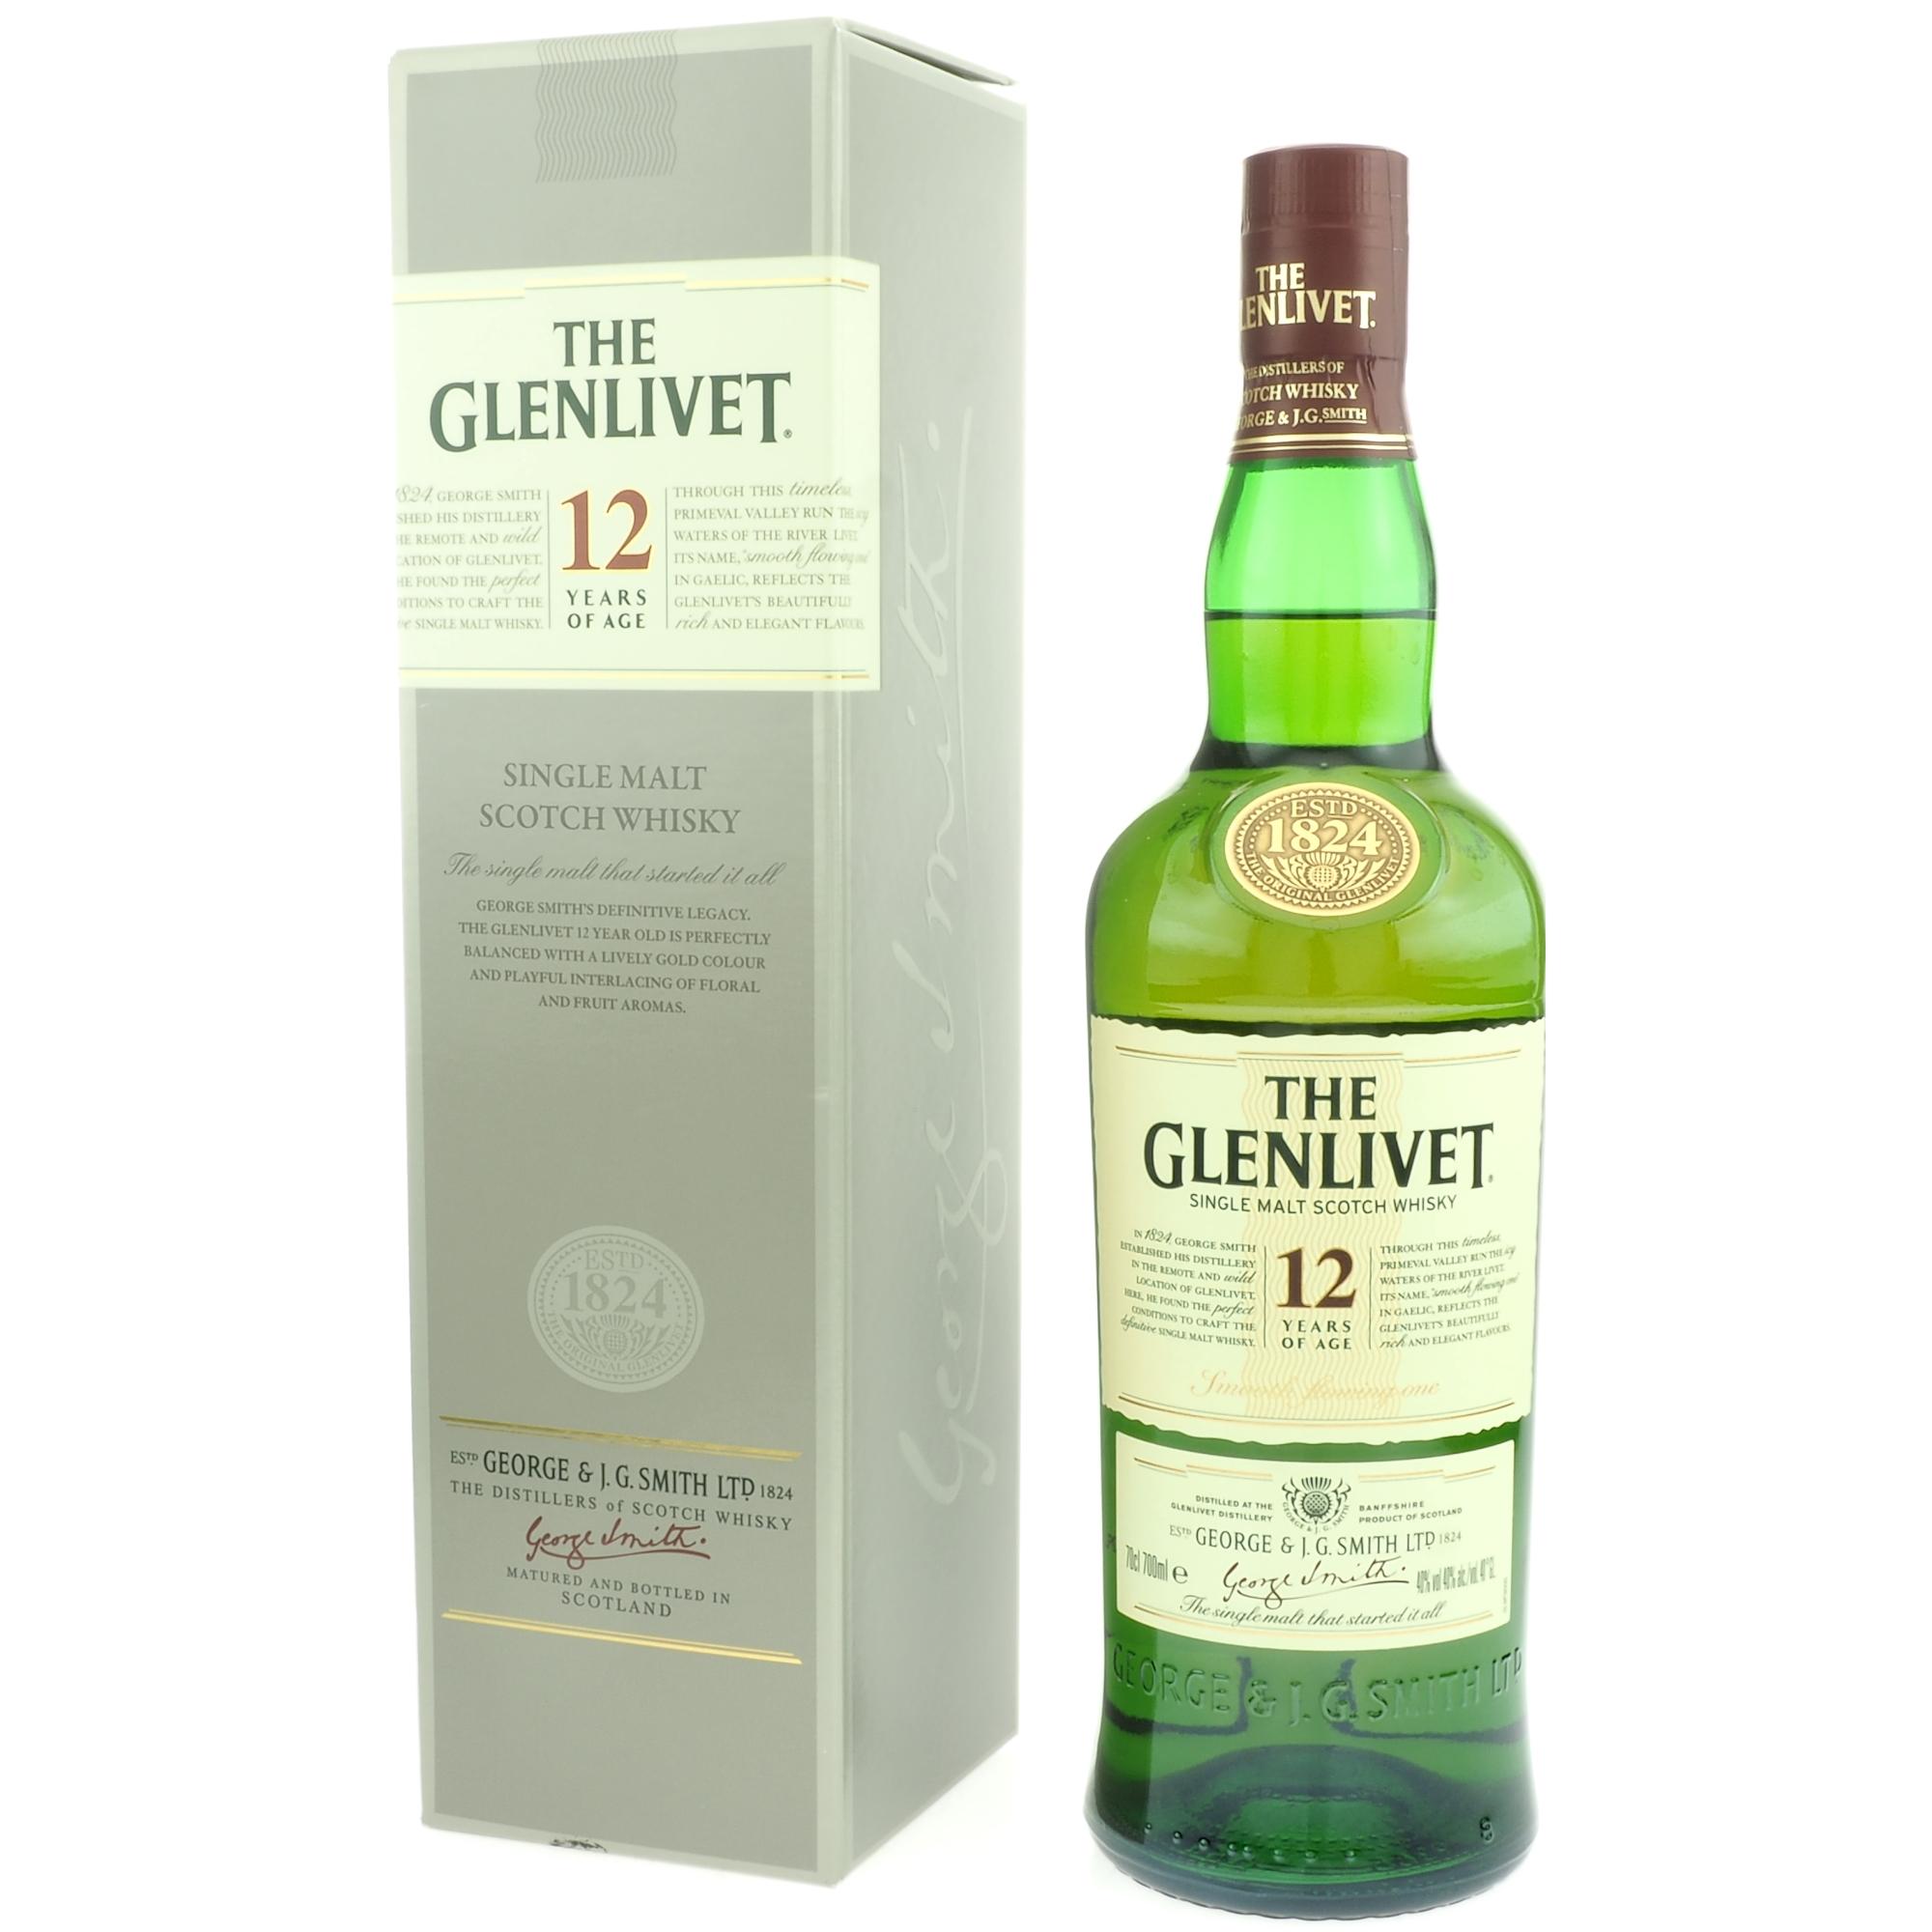 The Glenlivet 12 Years Of Age Single Malt Scotch Whisky